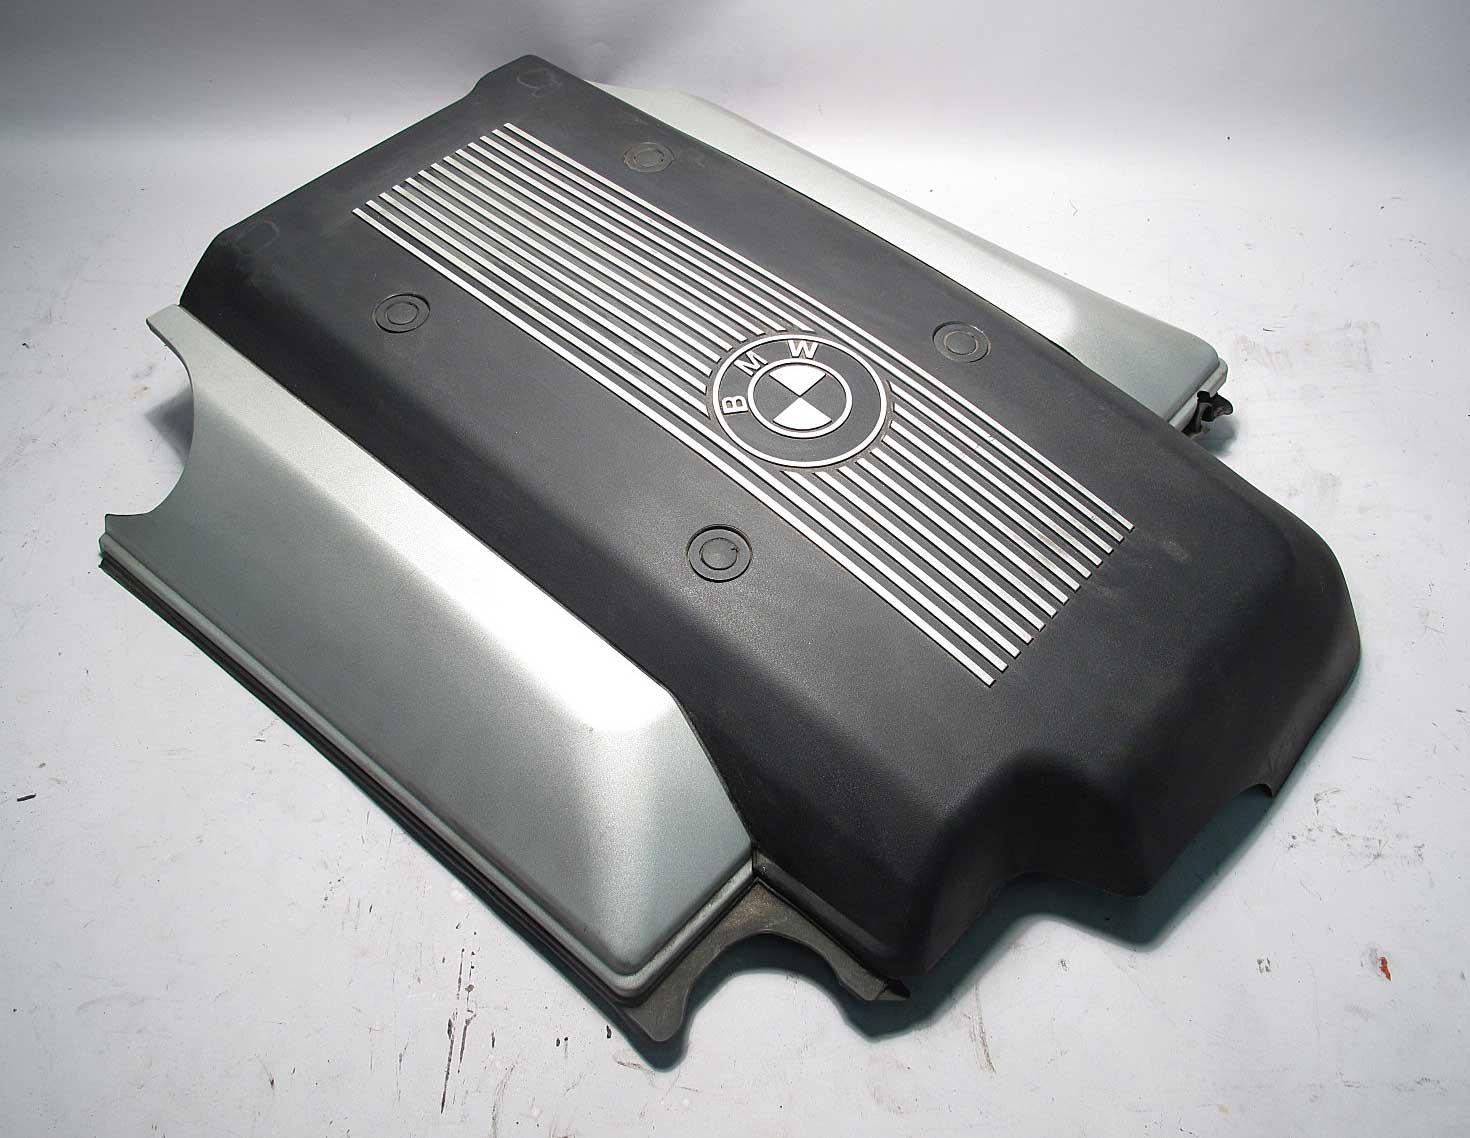 bmw e39 5 series 540i plastic engine cover v8 m62 1999. Black Bedroom Furniture Sets. Home Design Ideas